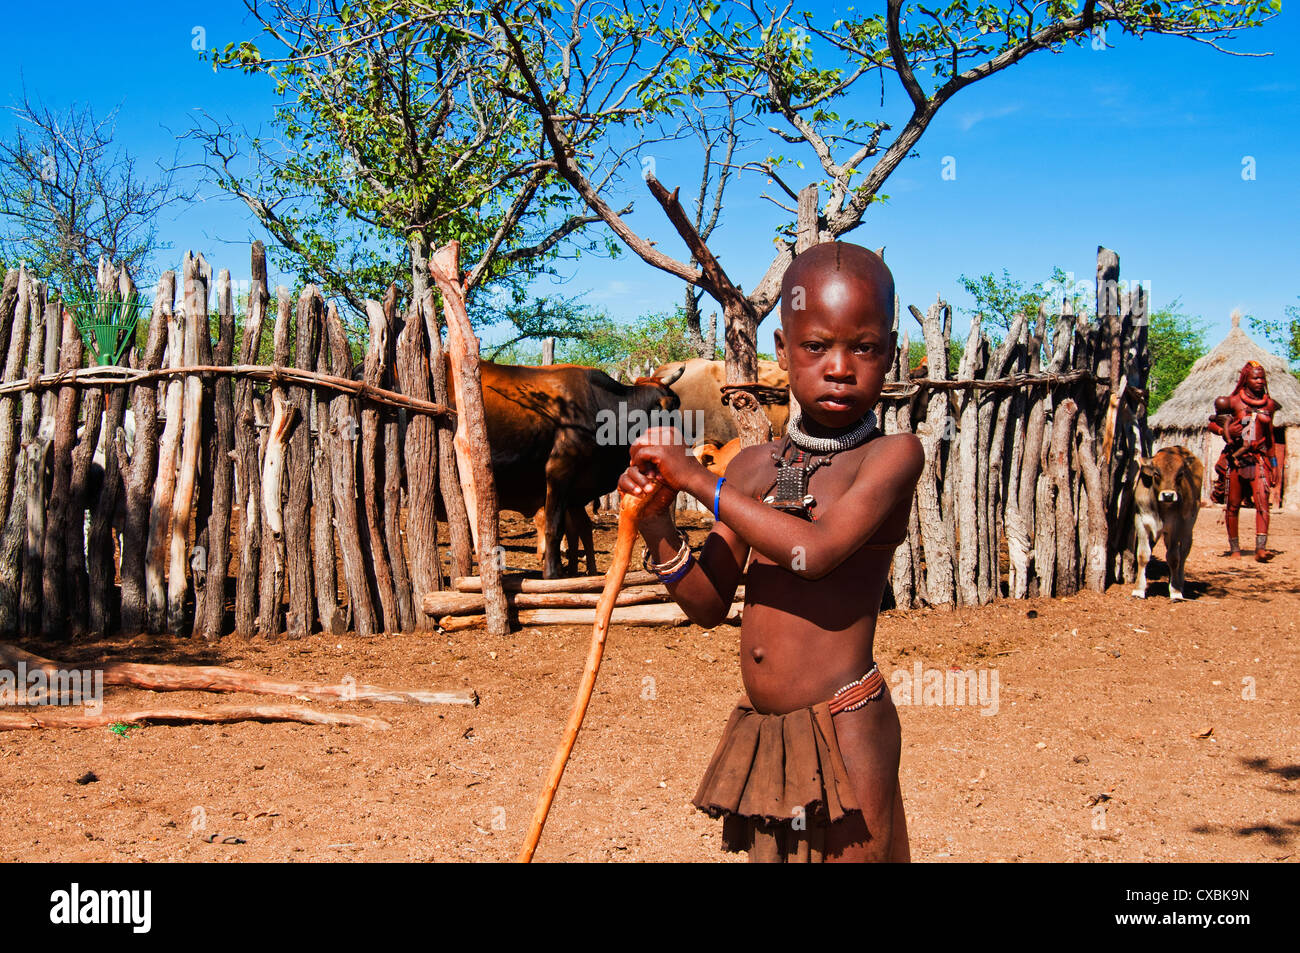 Garçon Himba, Kaokoveld, Namibie, Afrique Banque D'Images